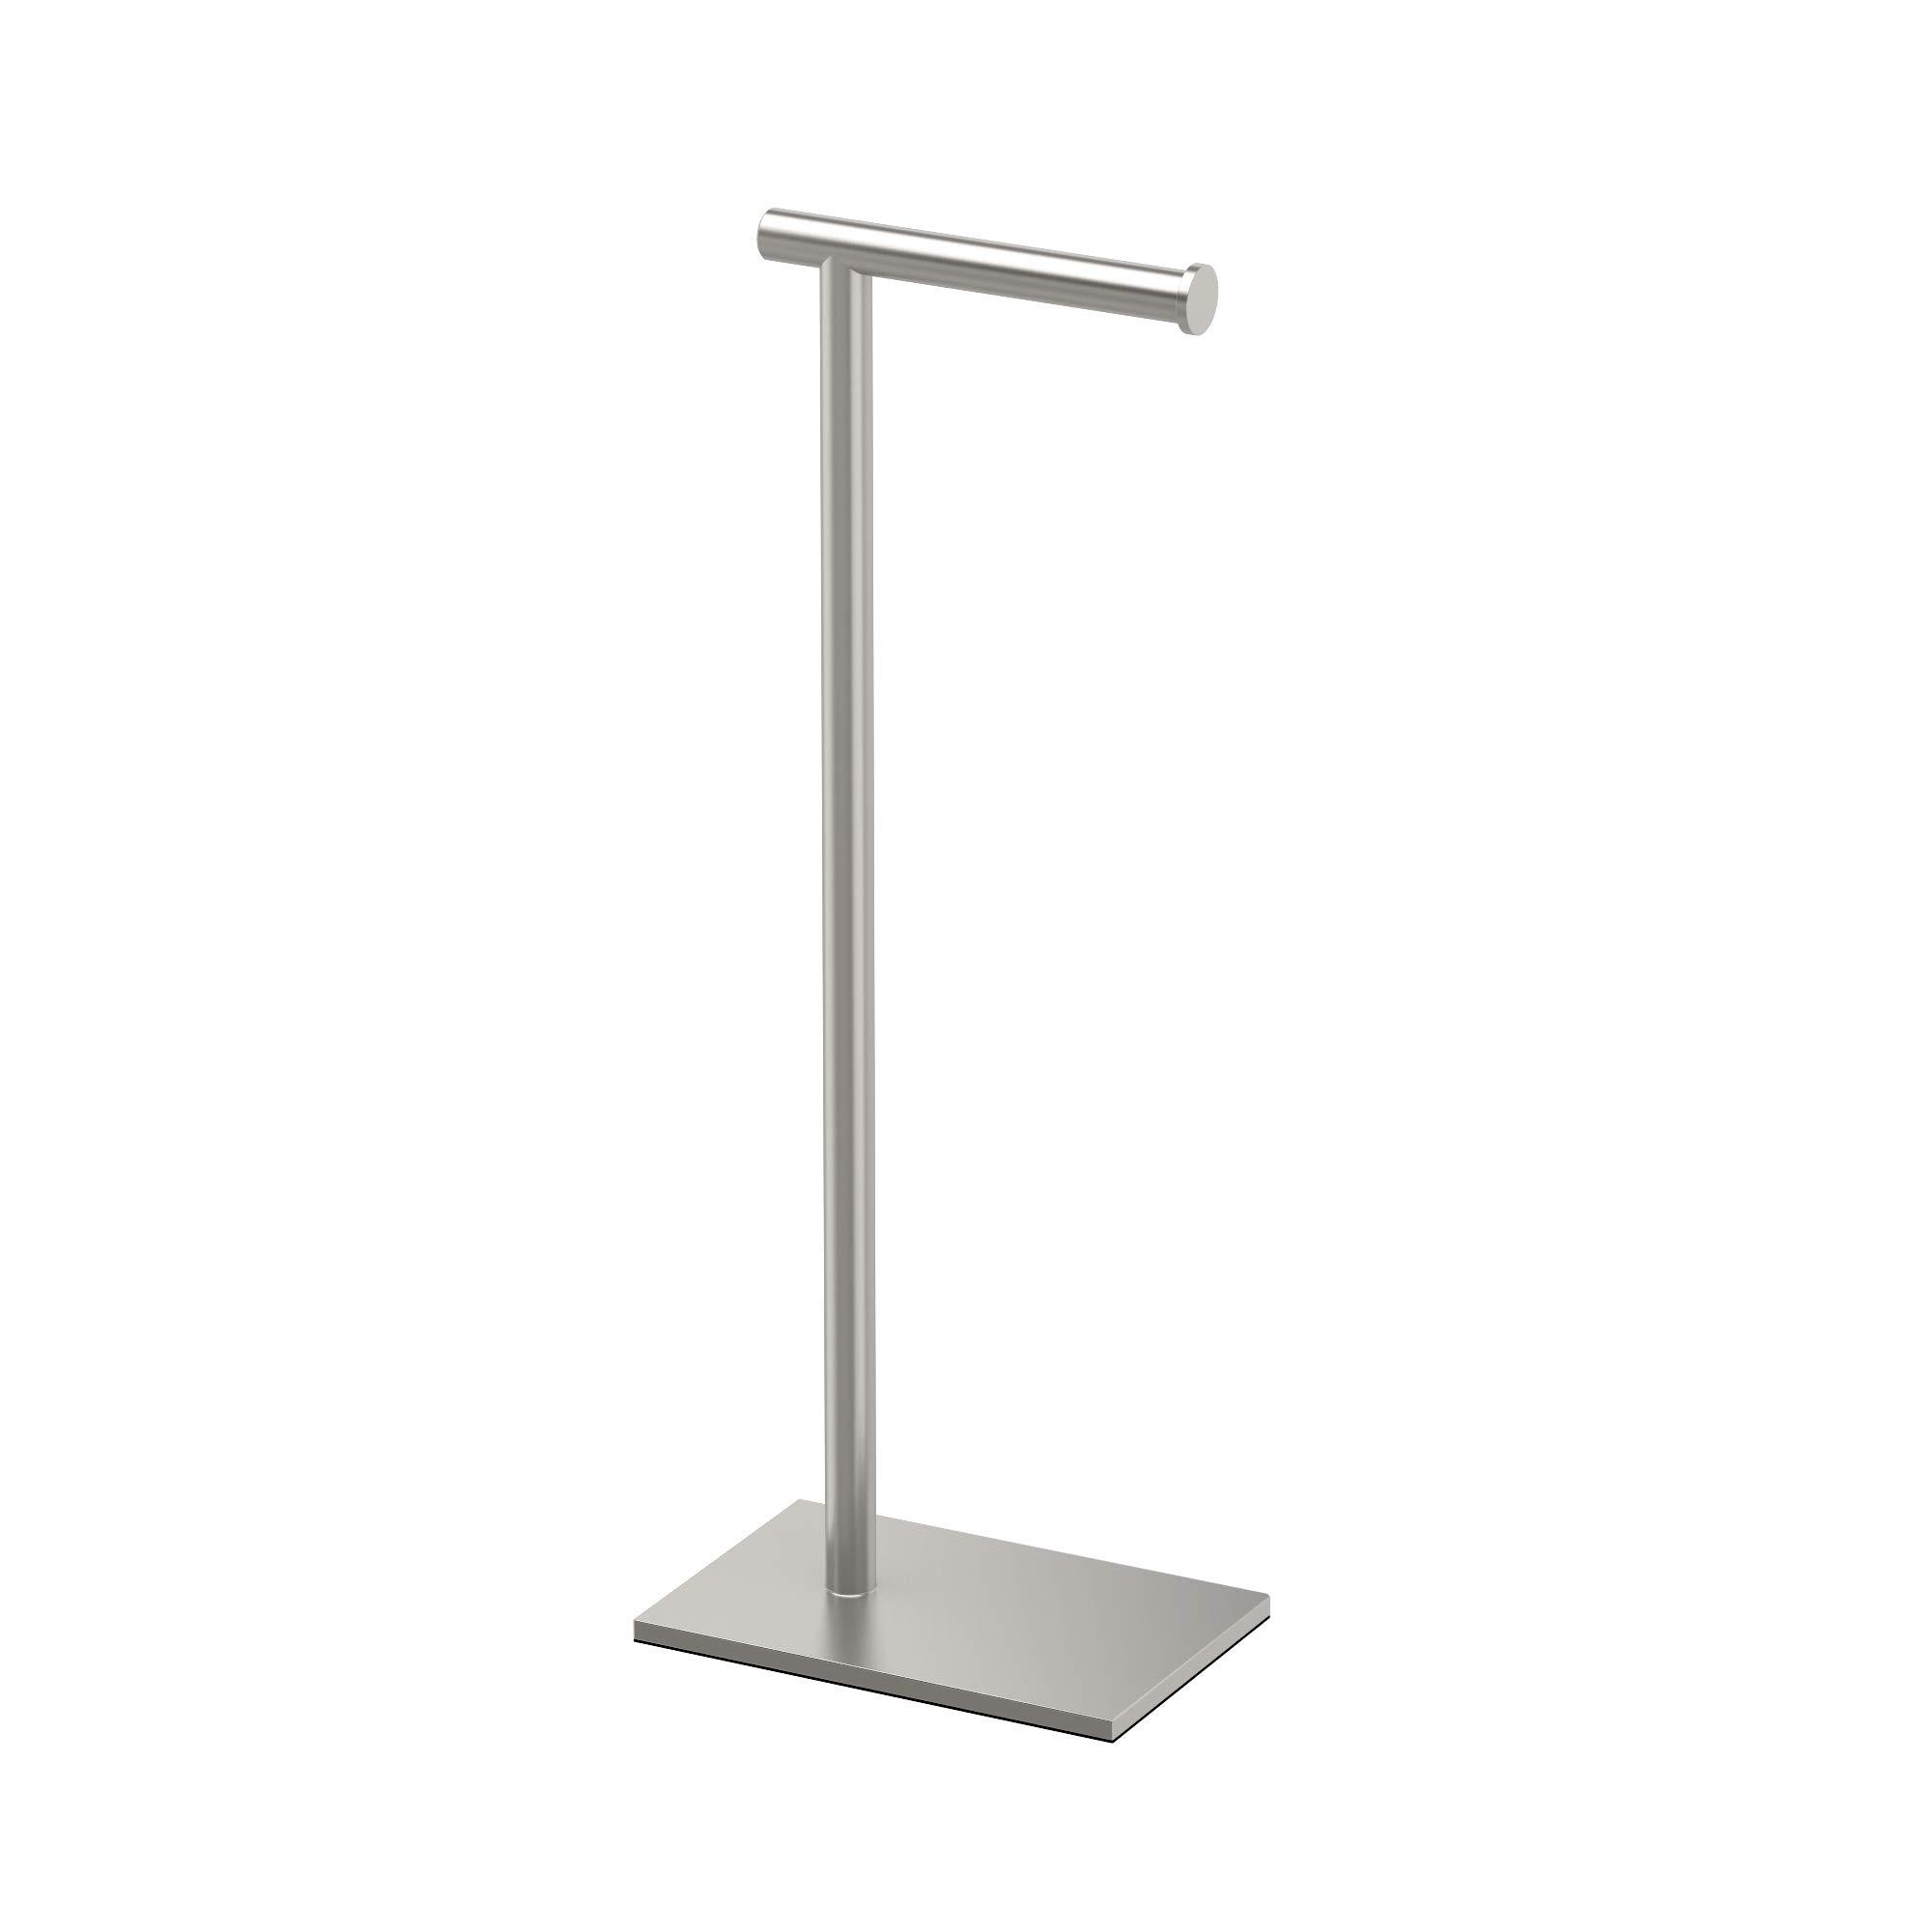 Gatco 1431SN Modern Rectangle Base Freestanding Toilet Paper Holder, 22.25-inch, Satin Nickel